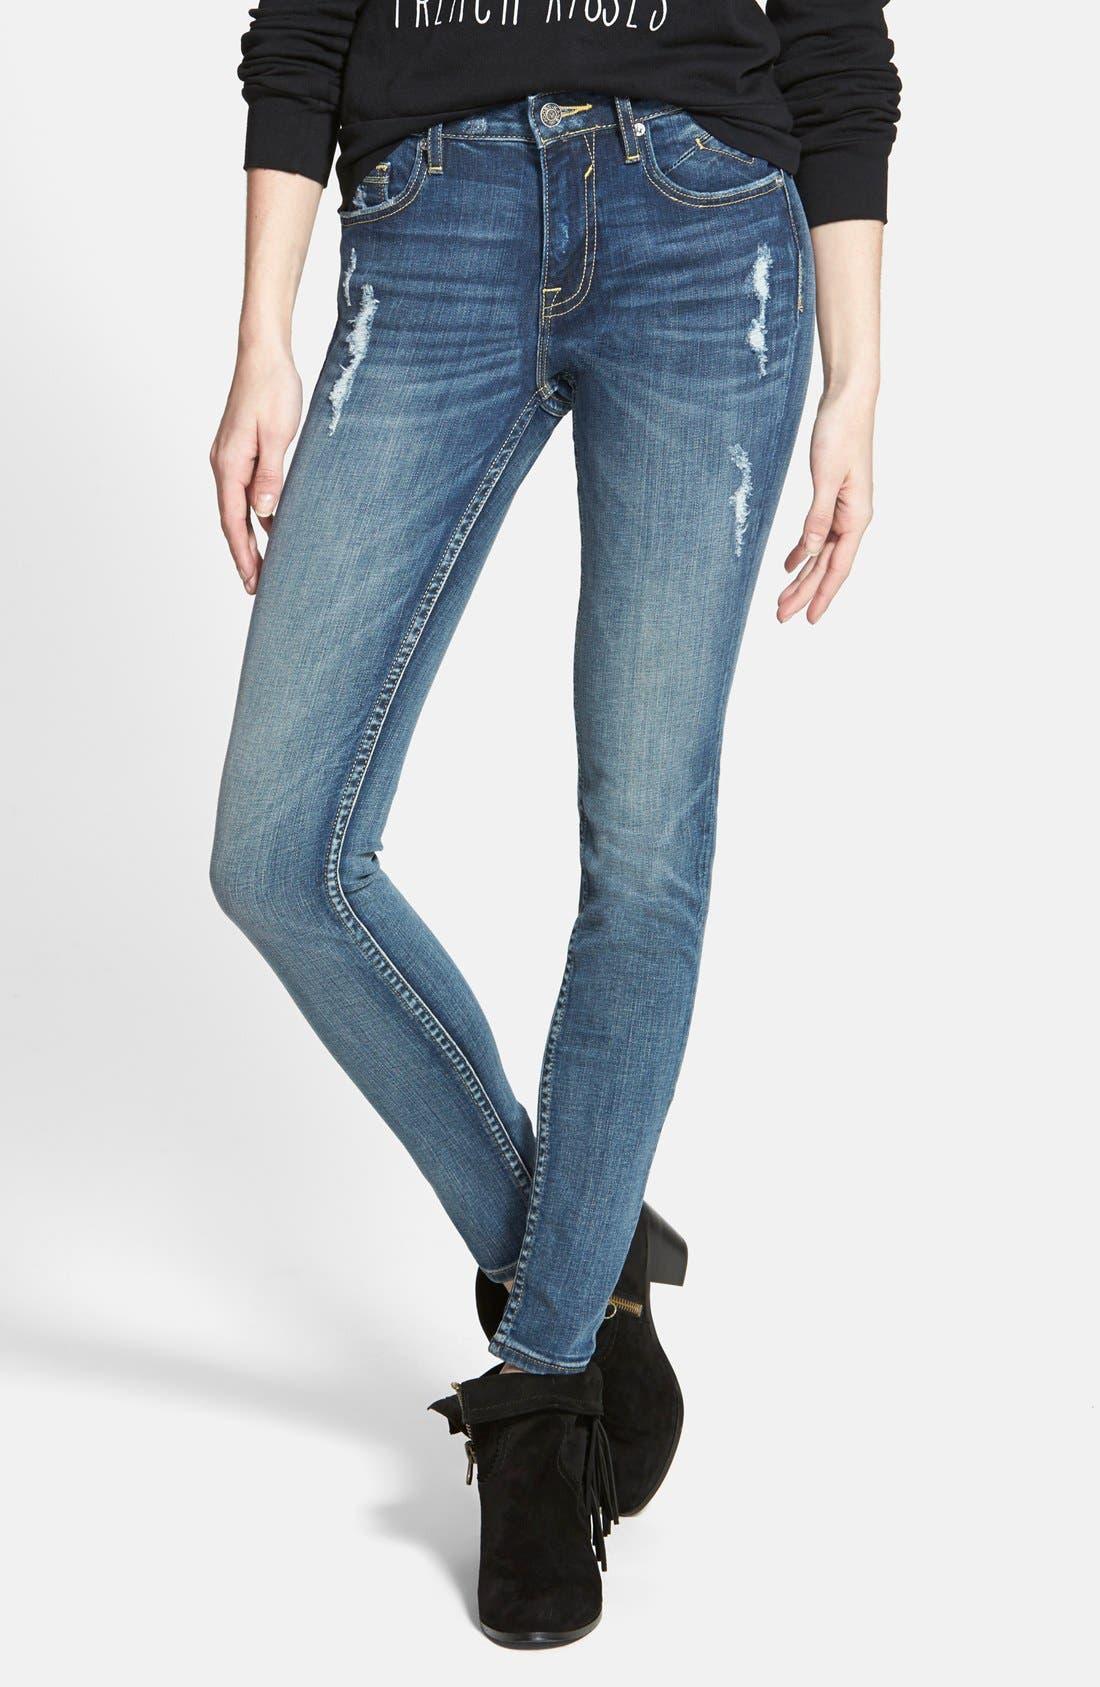 Main Image - Vigoss 'Dublin' Distressed Skinny Jeans (Medium Wash)